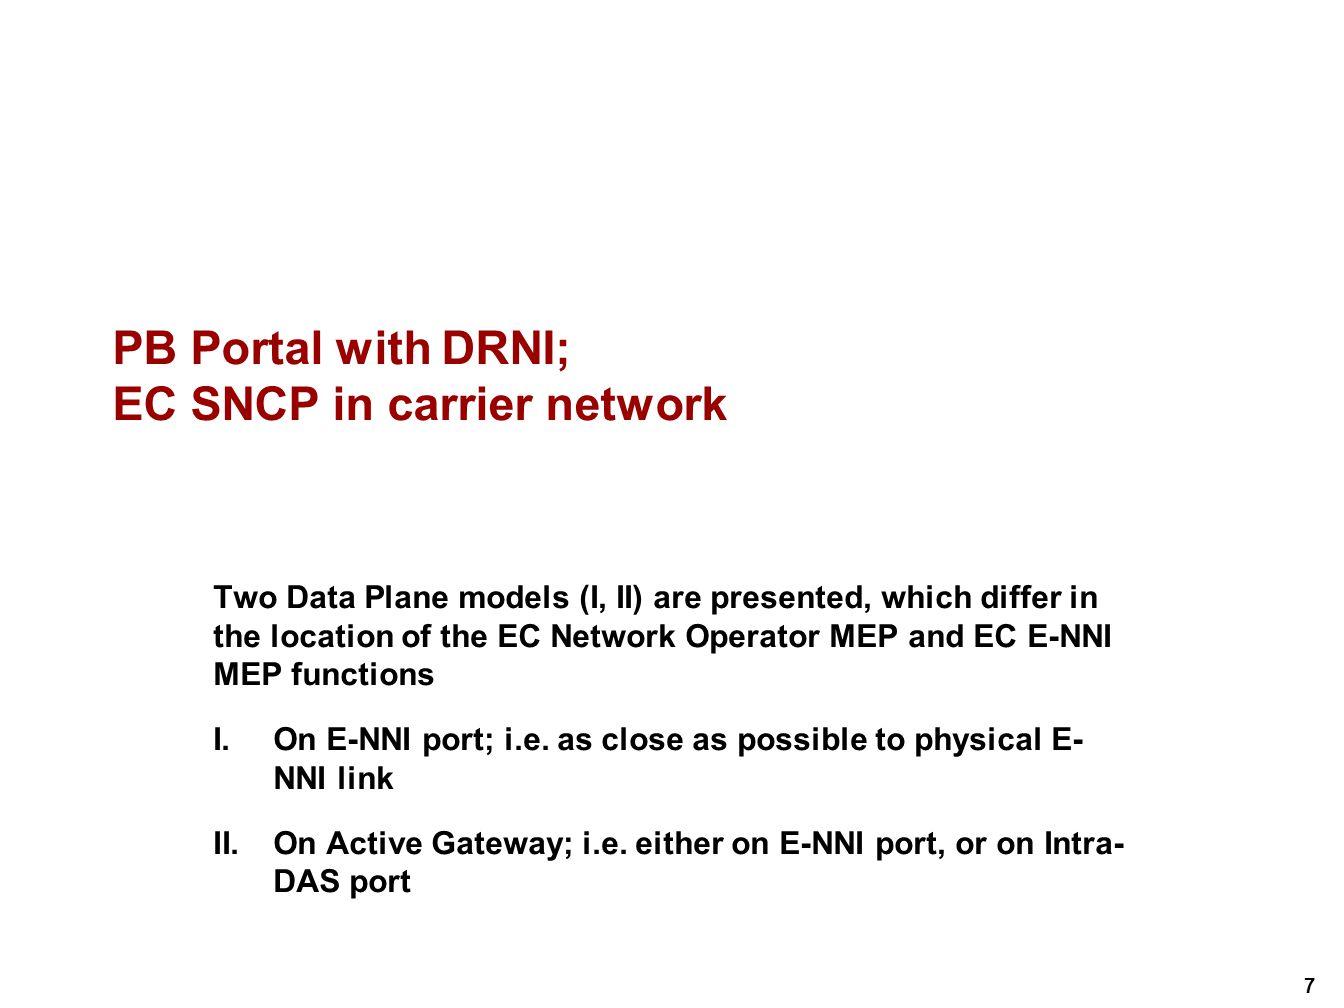 28 PBB Data Plane Model I/1 (example with BVLAN restoration) 19.2/3/5 6.9, 9.5b 8.5 19.2/3/5 6.9, 9.5b 8.5 E-NNI Link 2 19.2/3/5 6.9, 9.5b 8.5 19.2/3/5 6.9, 9.5b 8.5 19.2/3/5 6.9, 9.5b 8.5 E-NNI Link 3 Half-DAS S-Relay PIP 19.2/3/5 6.9, 9.5b 8.5 19.2 6.7 802.3 Half-DAS S-Relay 19.2/3/5 6.9, 9.5b 8.5 19.2 6.7 802.3 E-NNI Link 1 19.2/3/5 6.9, 9.5b 8.5 19.2 6.7 802.3 19.2/3/5 6.9, 9.5b 8.5 19.2 6.7 802.3 E-NNI Link 4 6.14 6.10 6.14 6.11, 9.5c 19.2/3/5 6.14 6.10 6.14 6.11, 9.5c 19.2/3/5 PNP 6.14 6.10 6.14 6.11, 9.5c 19.2/3/5 6.14 6.10 6.14 6.11, 9.5c 19.2/3/5 6.14 6.10 6.14 6.11, 9.5c 19.2/3/5 CBP Network Virtual Link Intra-DAS Virtual Link 19.2/3/5 6.9, 9.5b 8.5 6.14 6.10 6.14 6.11, 9.5c 19.2/3/5 BVLAN MEP EC NO MEP EC E-NNI MEP EC SP MIP EC NO MIP Link MEP Half-DVS DVS: Distributed VLAN restoration Sublayer @A @.